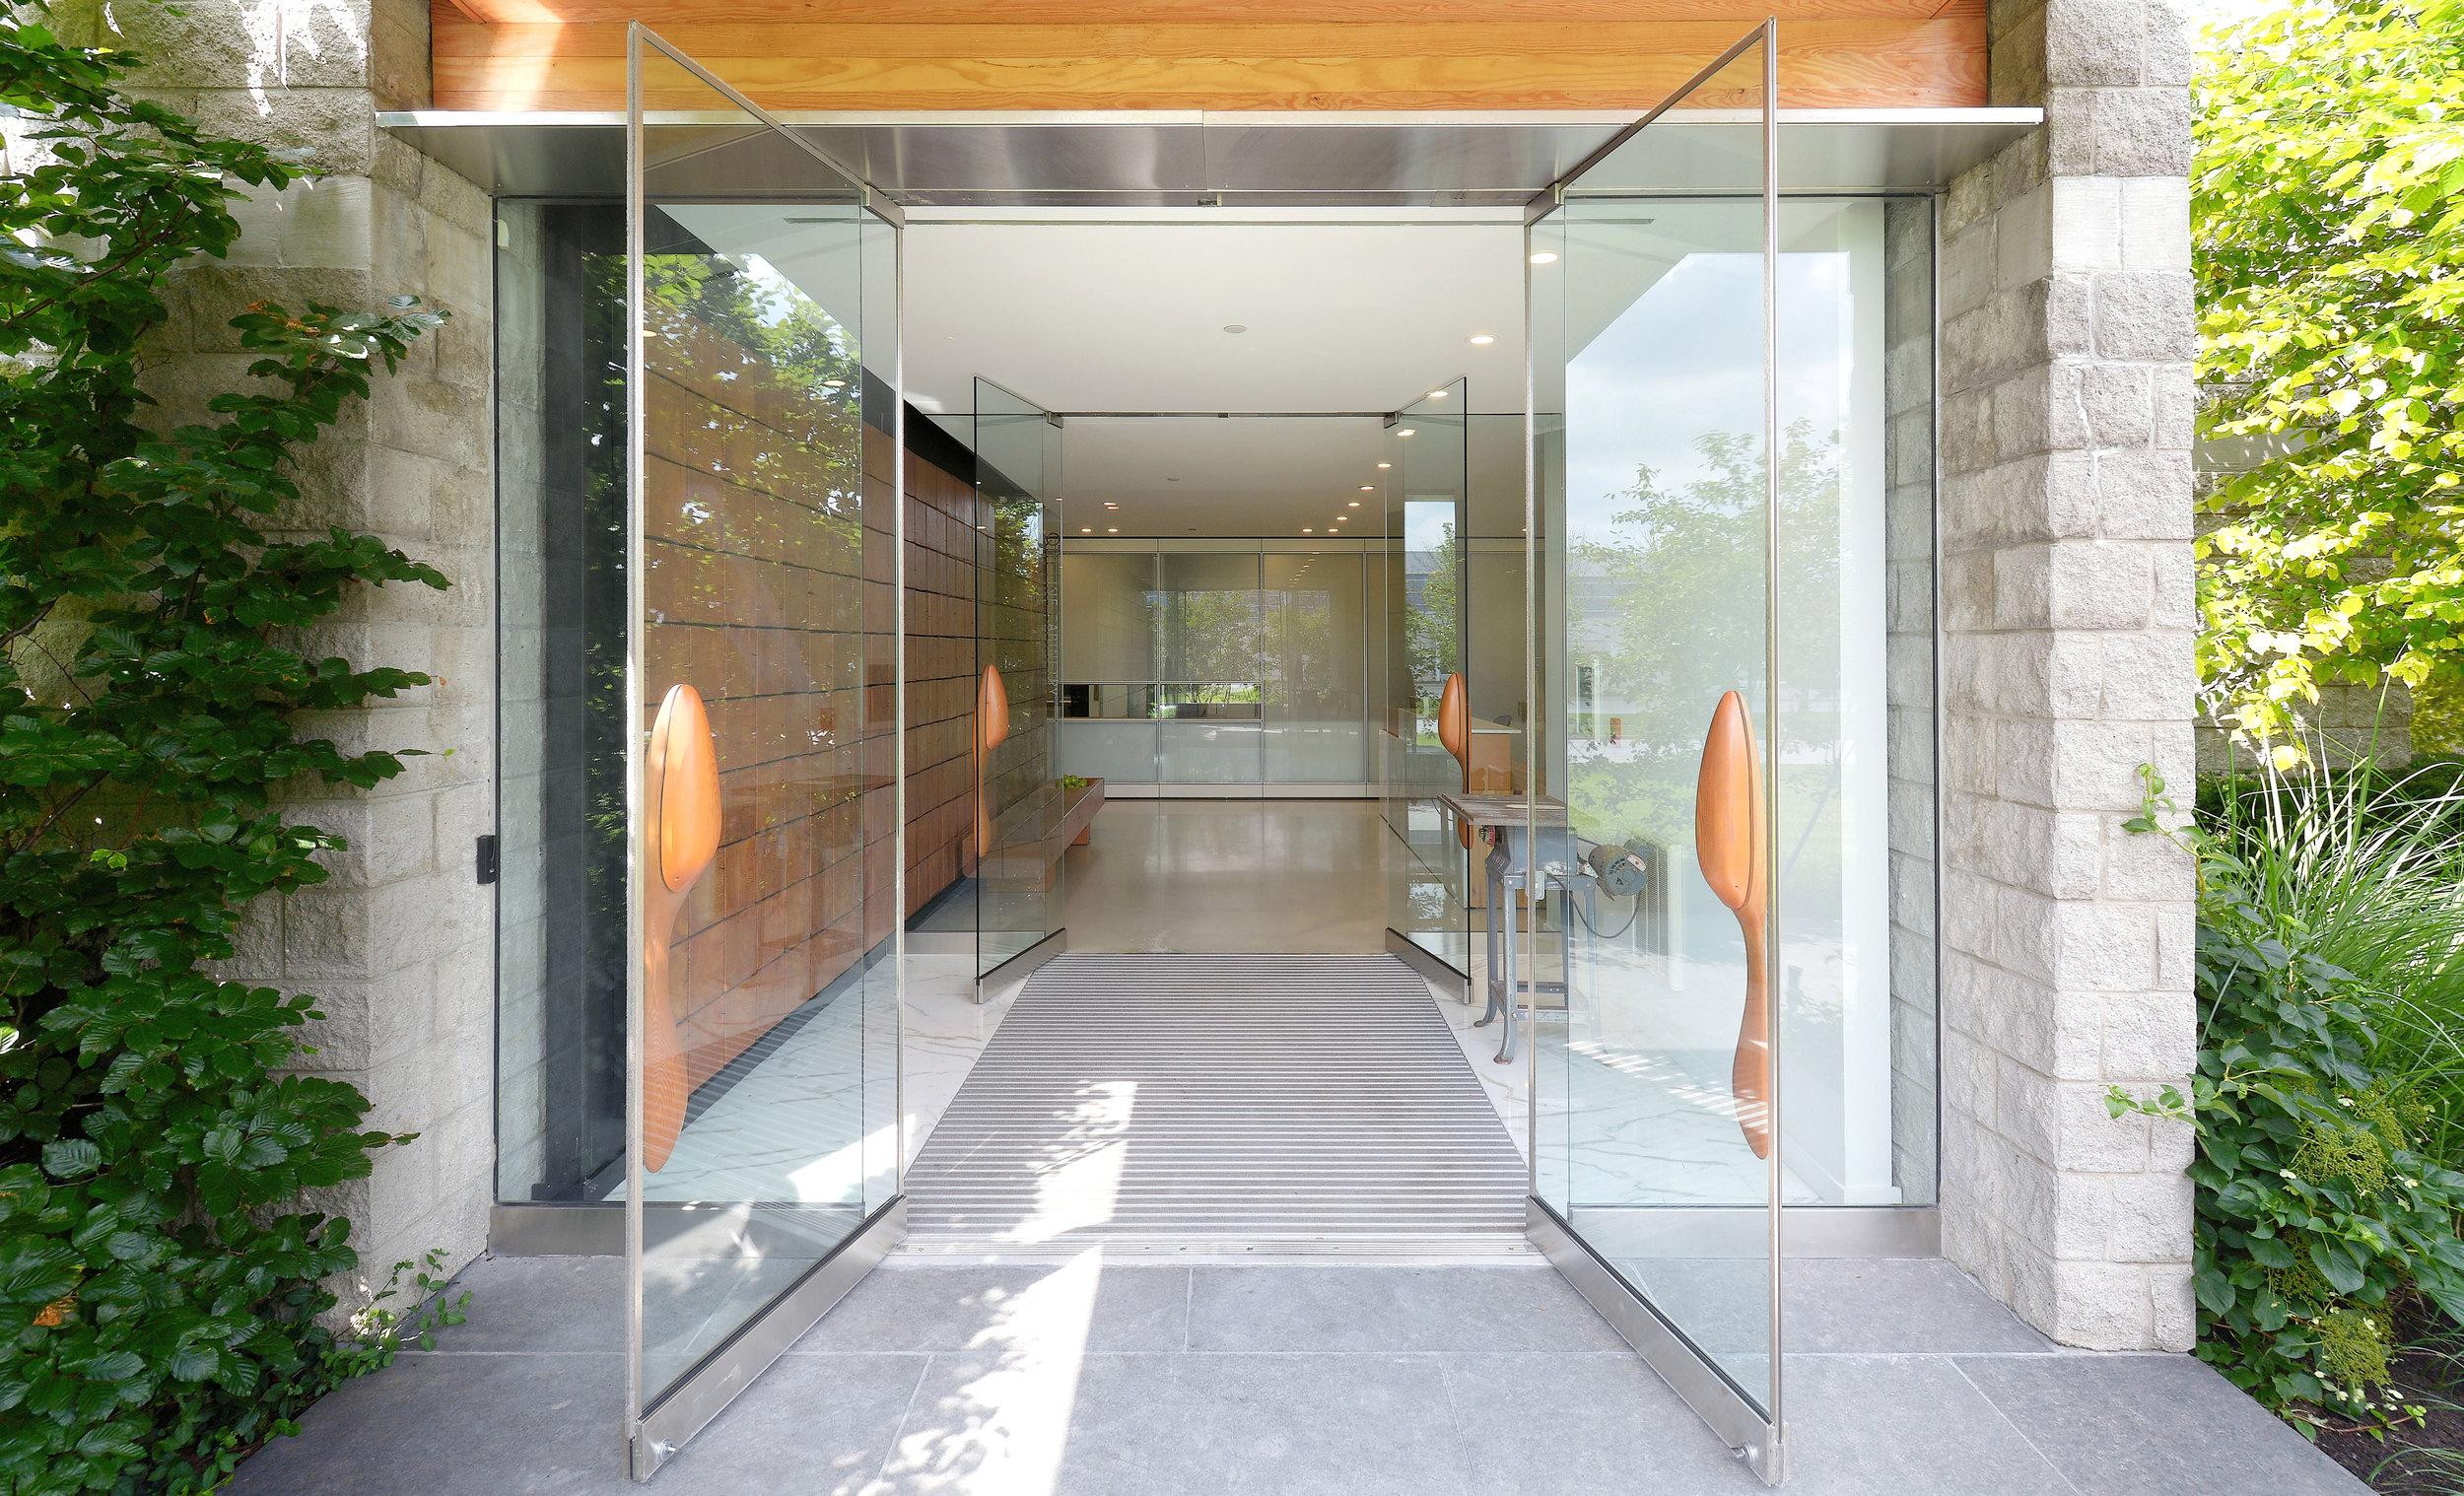 QTK Head Office and Showroom